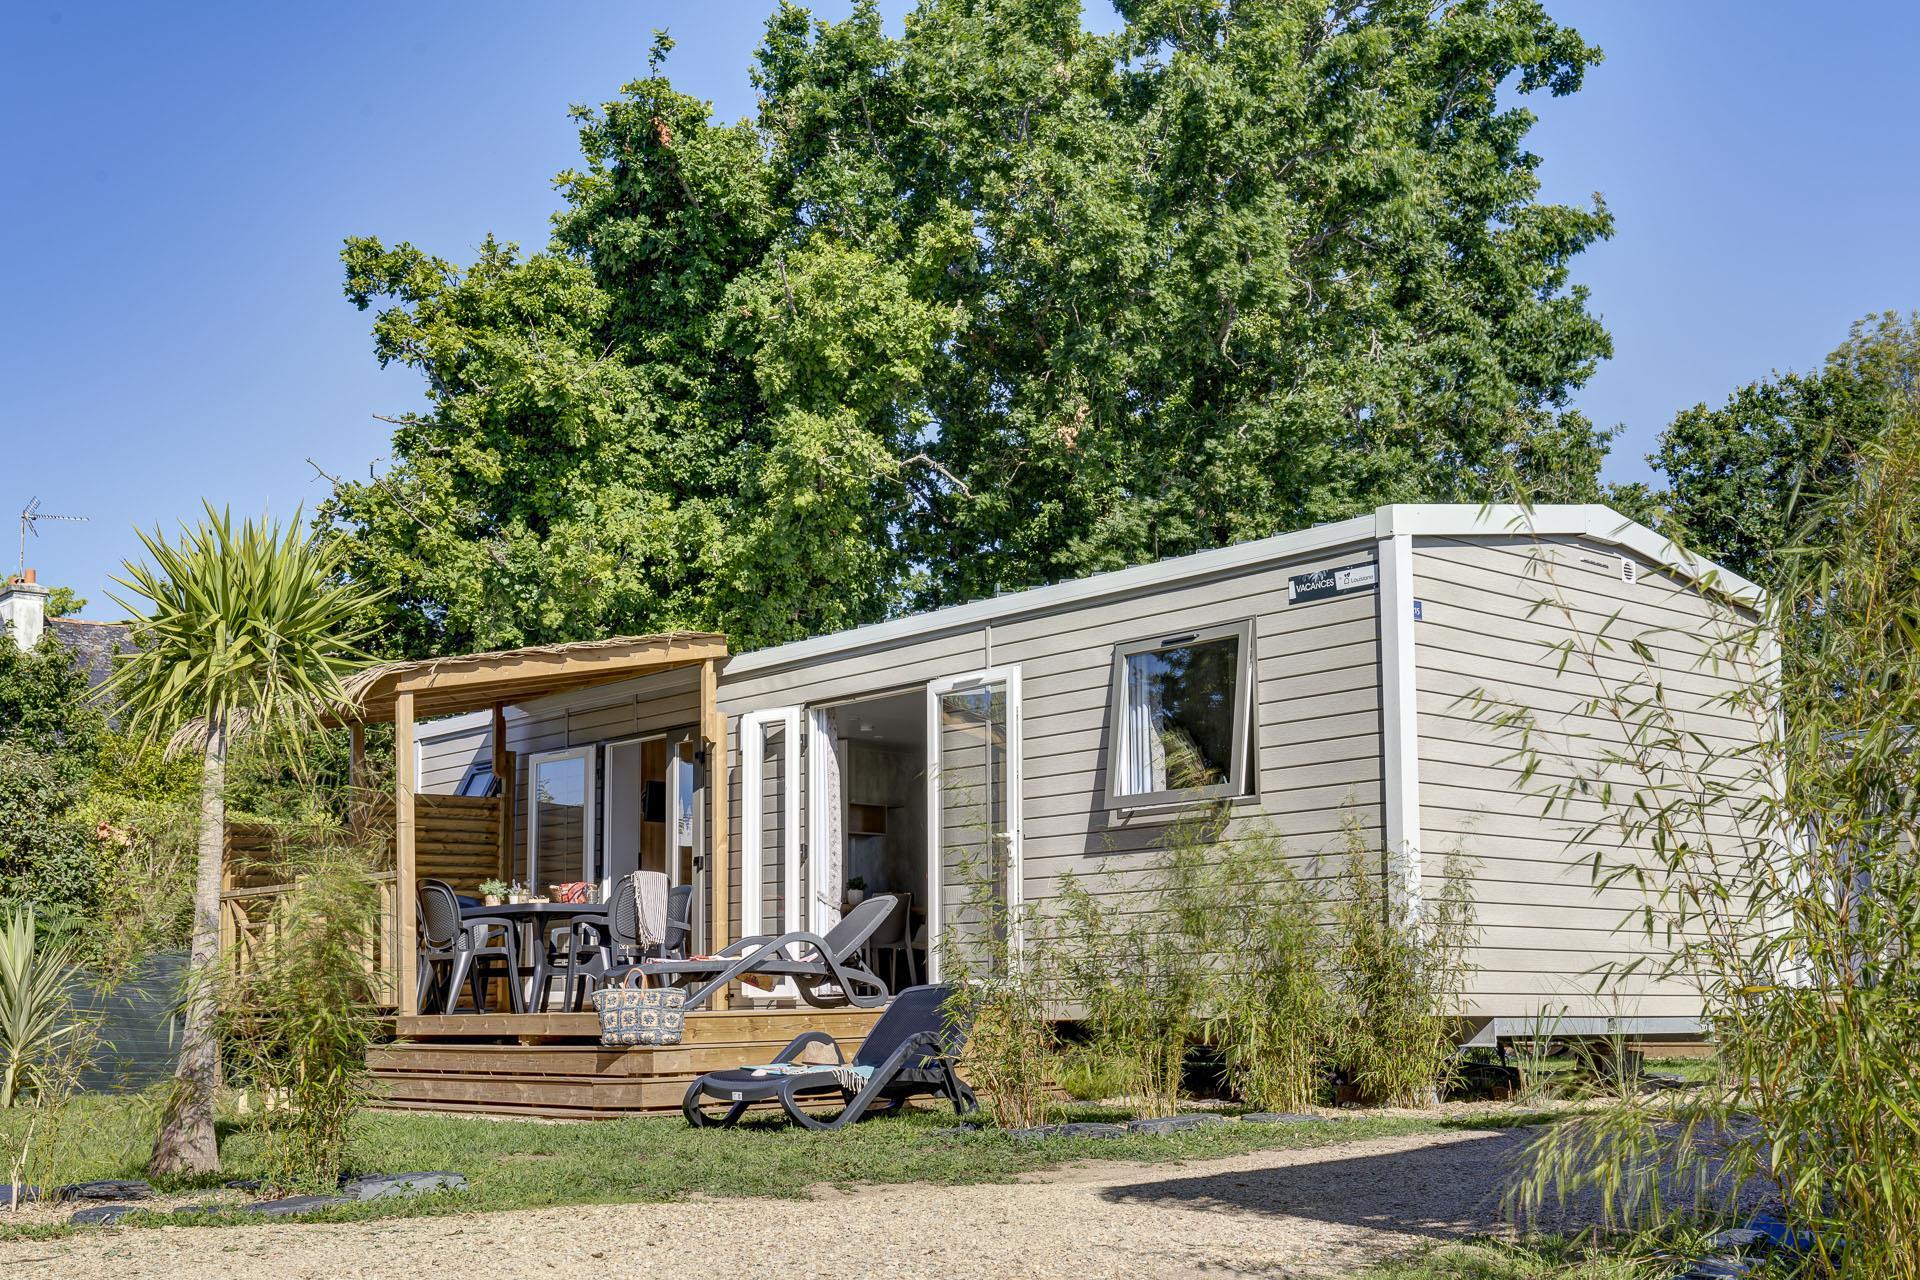 Location - Prestige Cabellou 3 Chambres 2 Salles De Bain 40M² - Camping Le Cabellou Plage